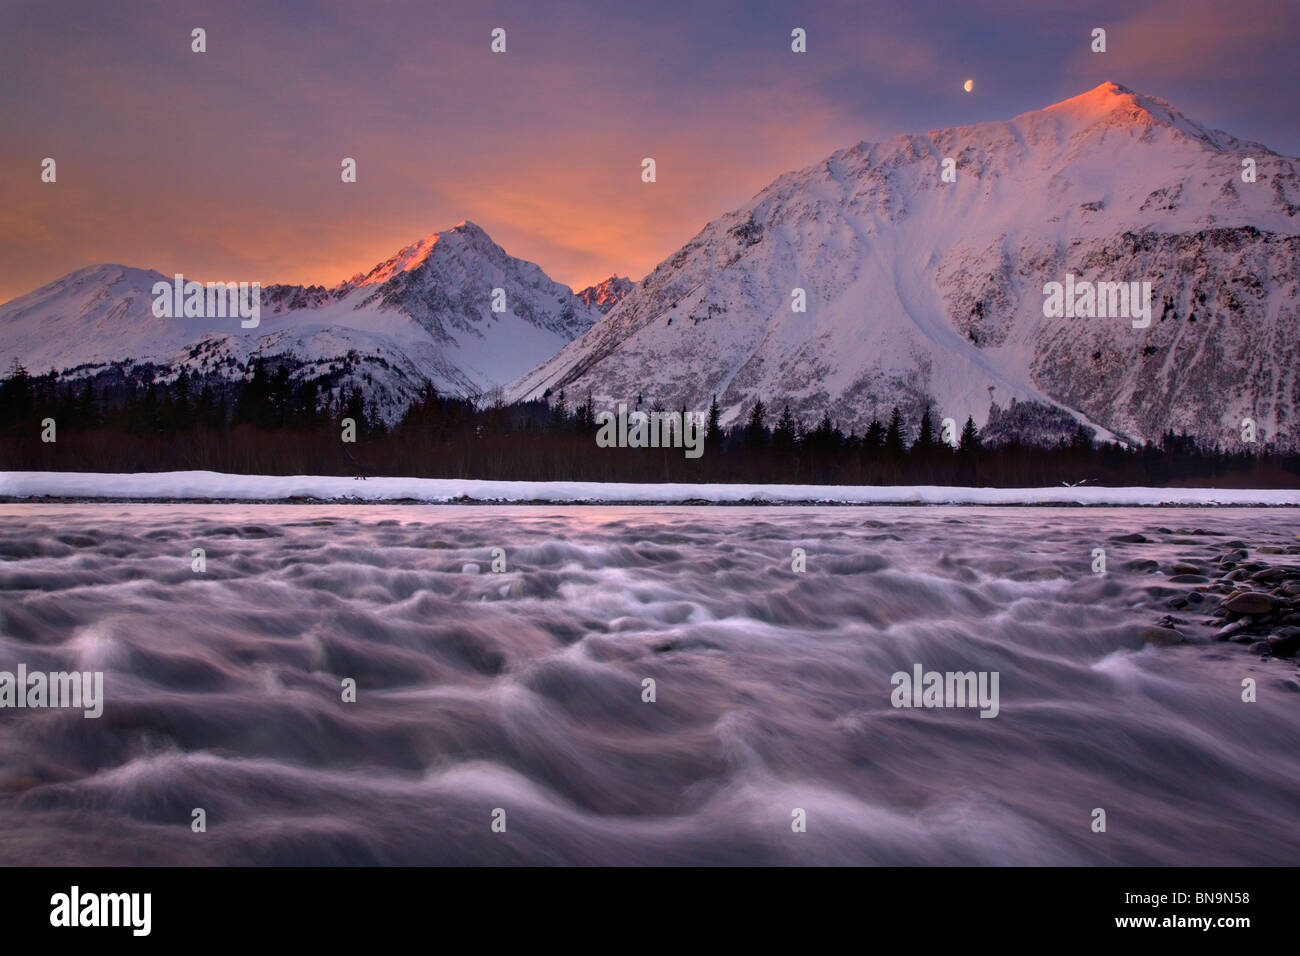 Resurrección River, Seward, Alaska. Imagen De Stock